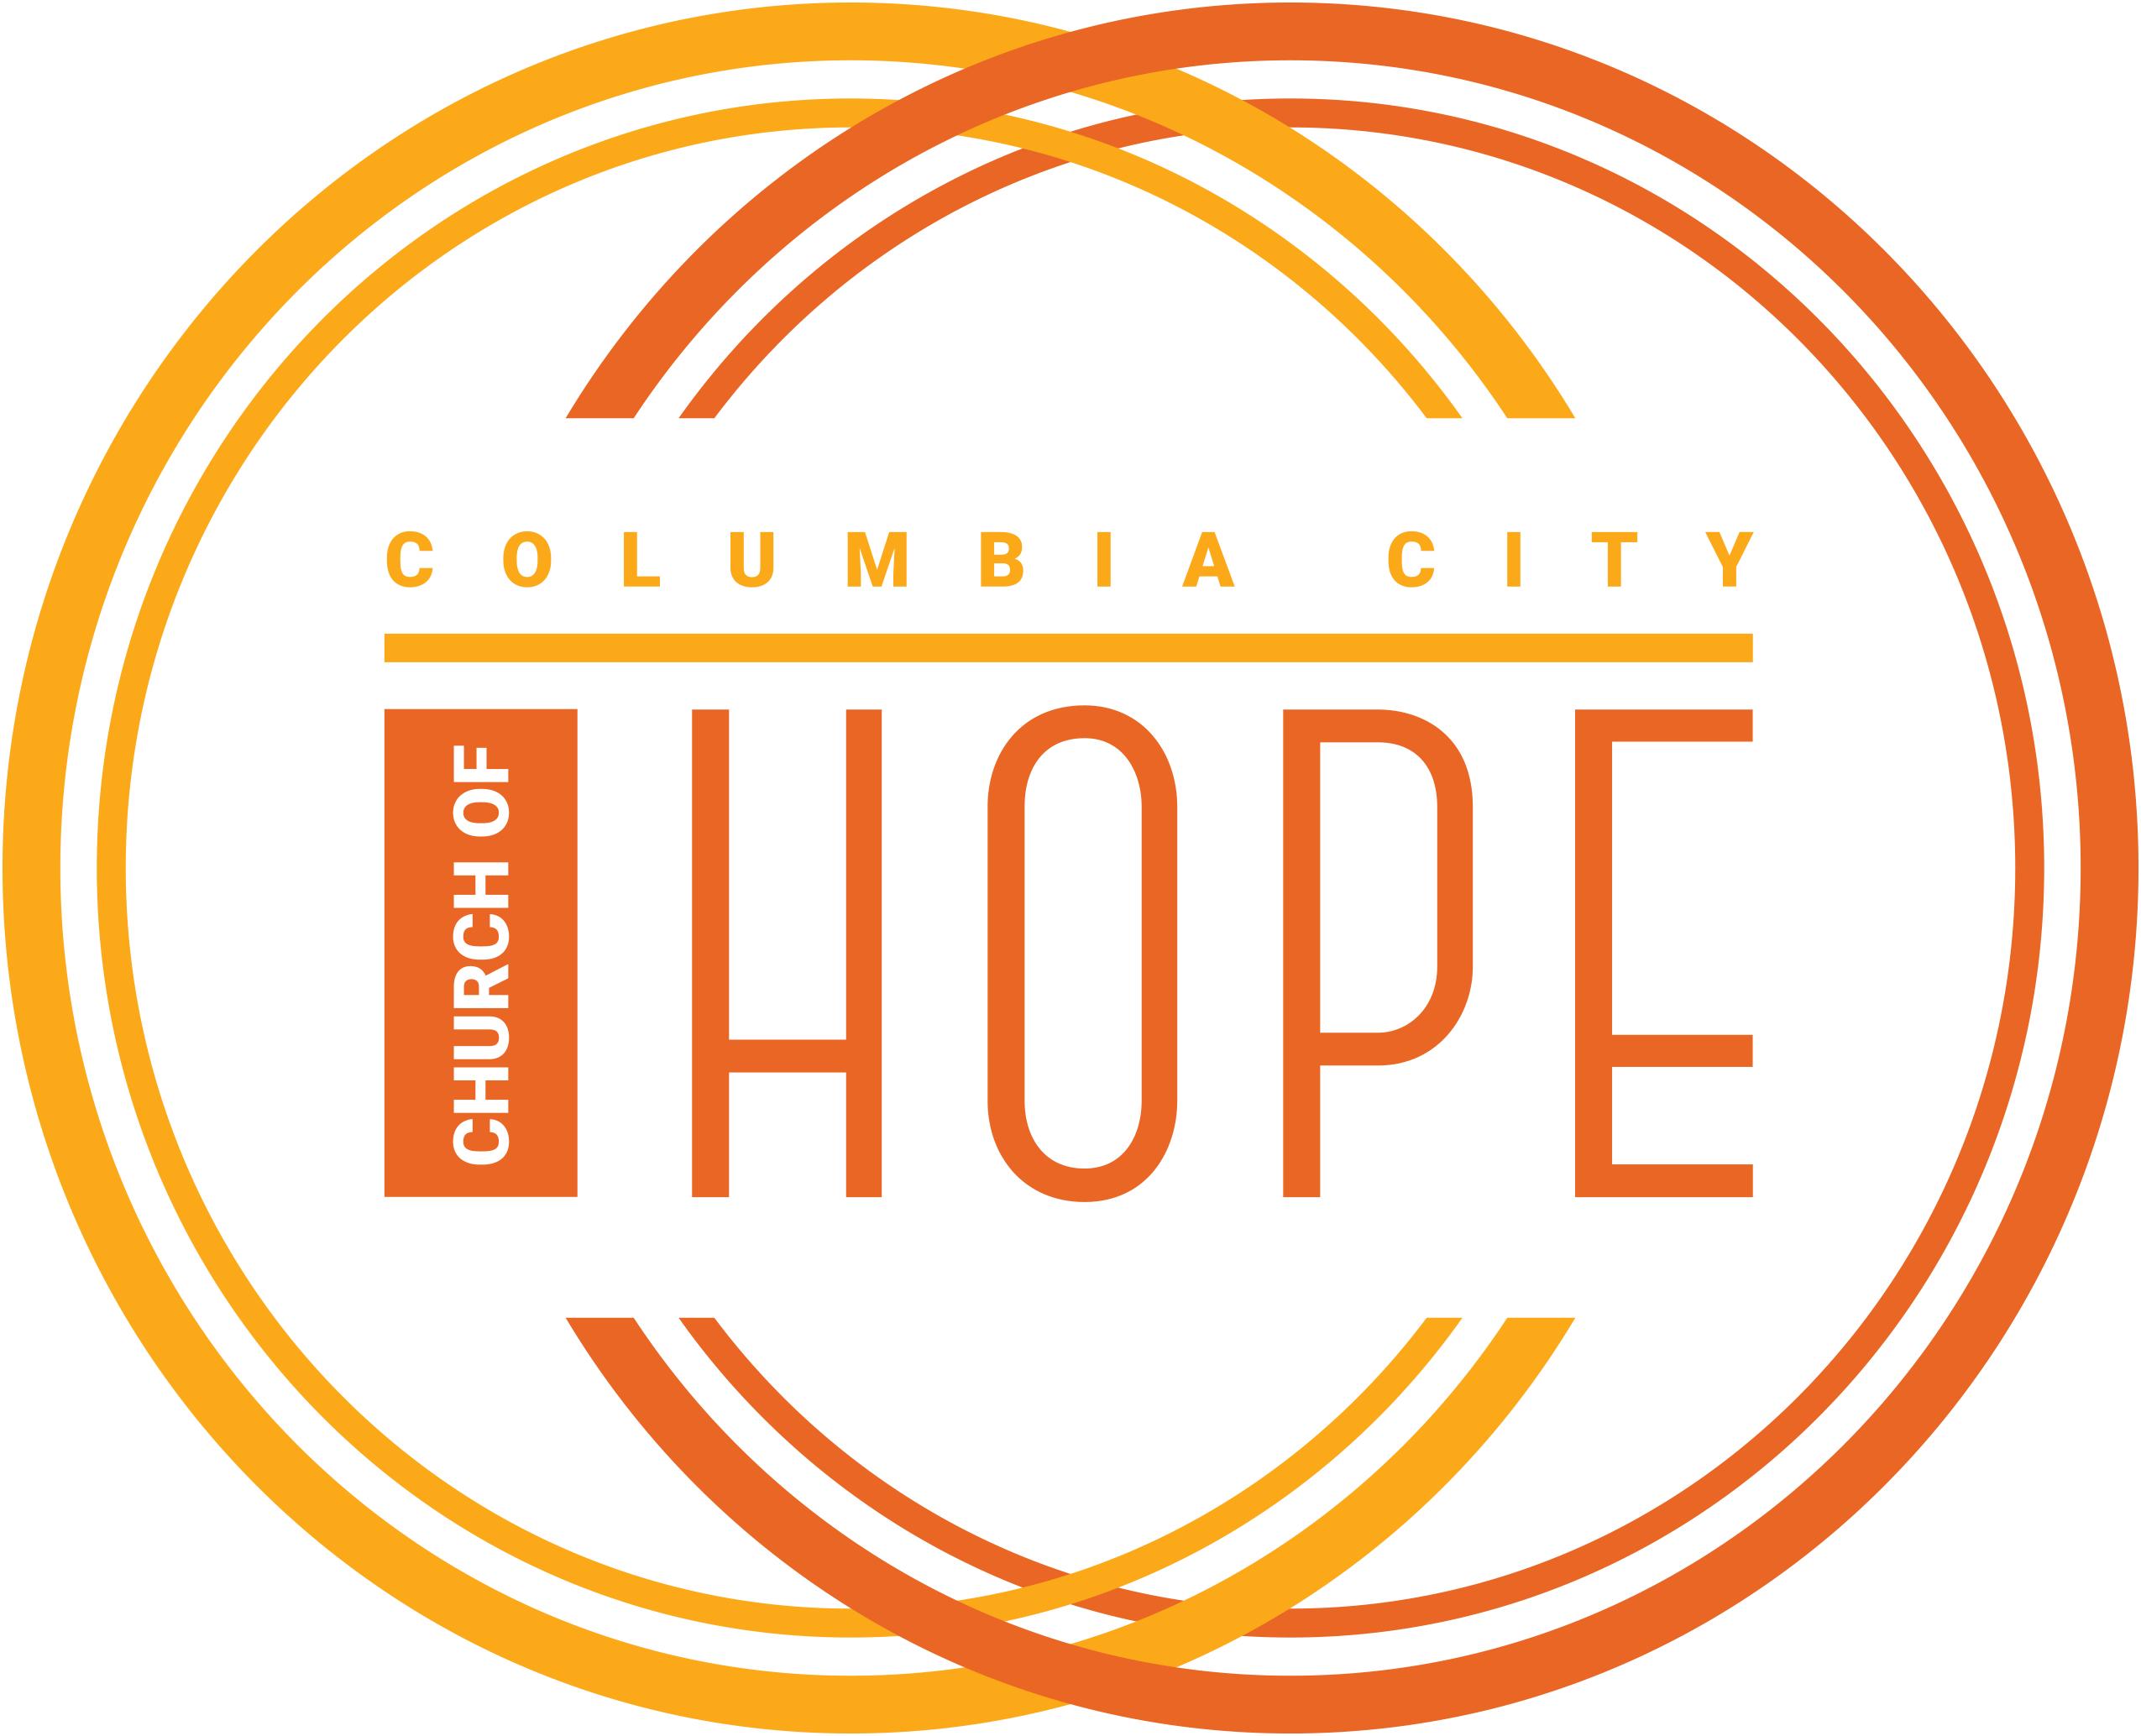 Columbia City Church of Hope